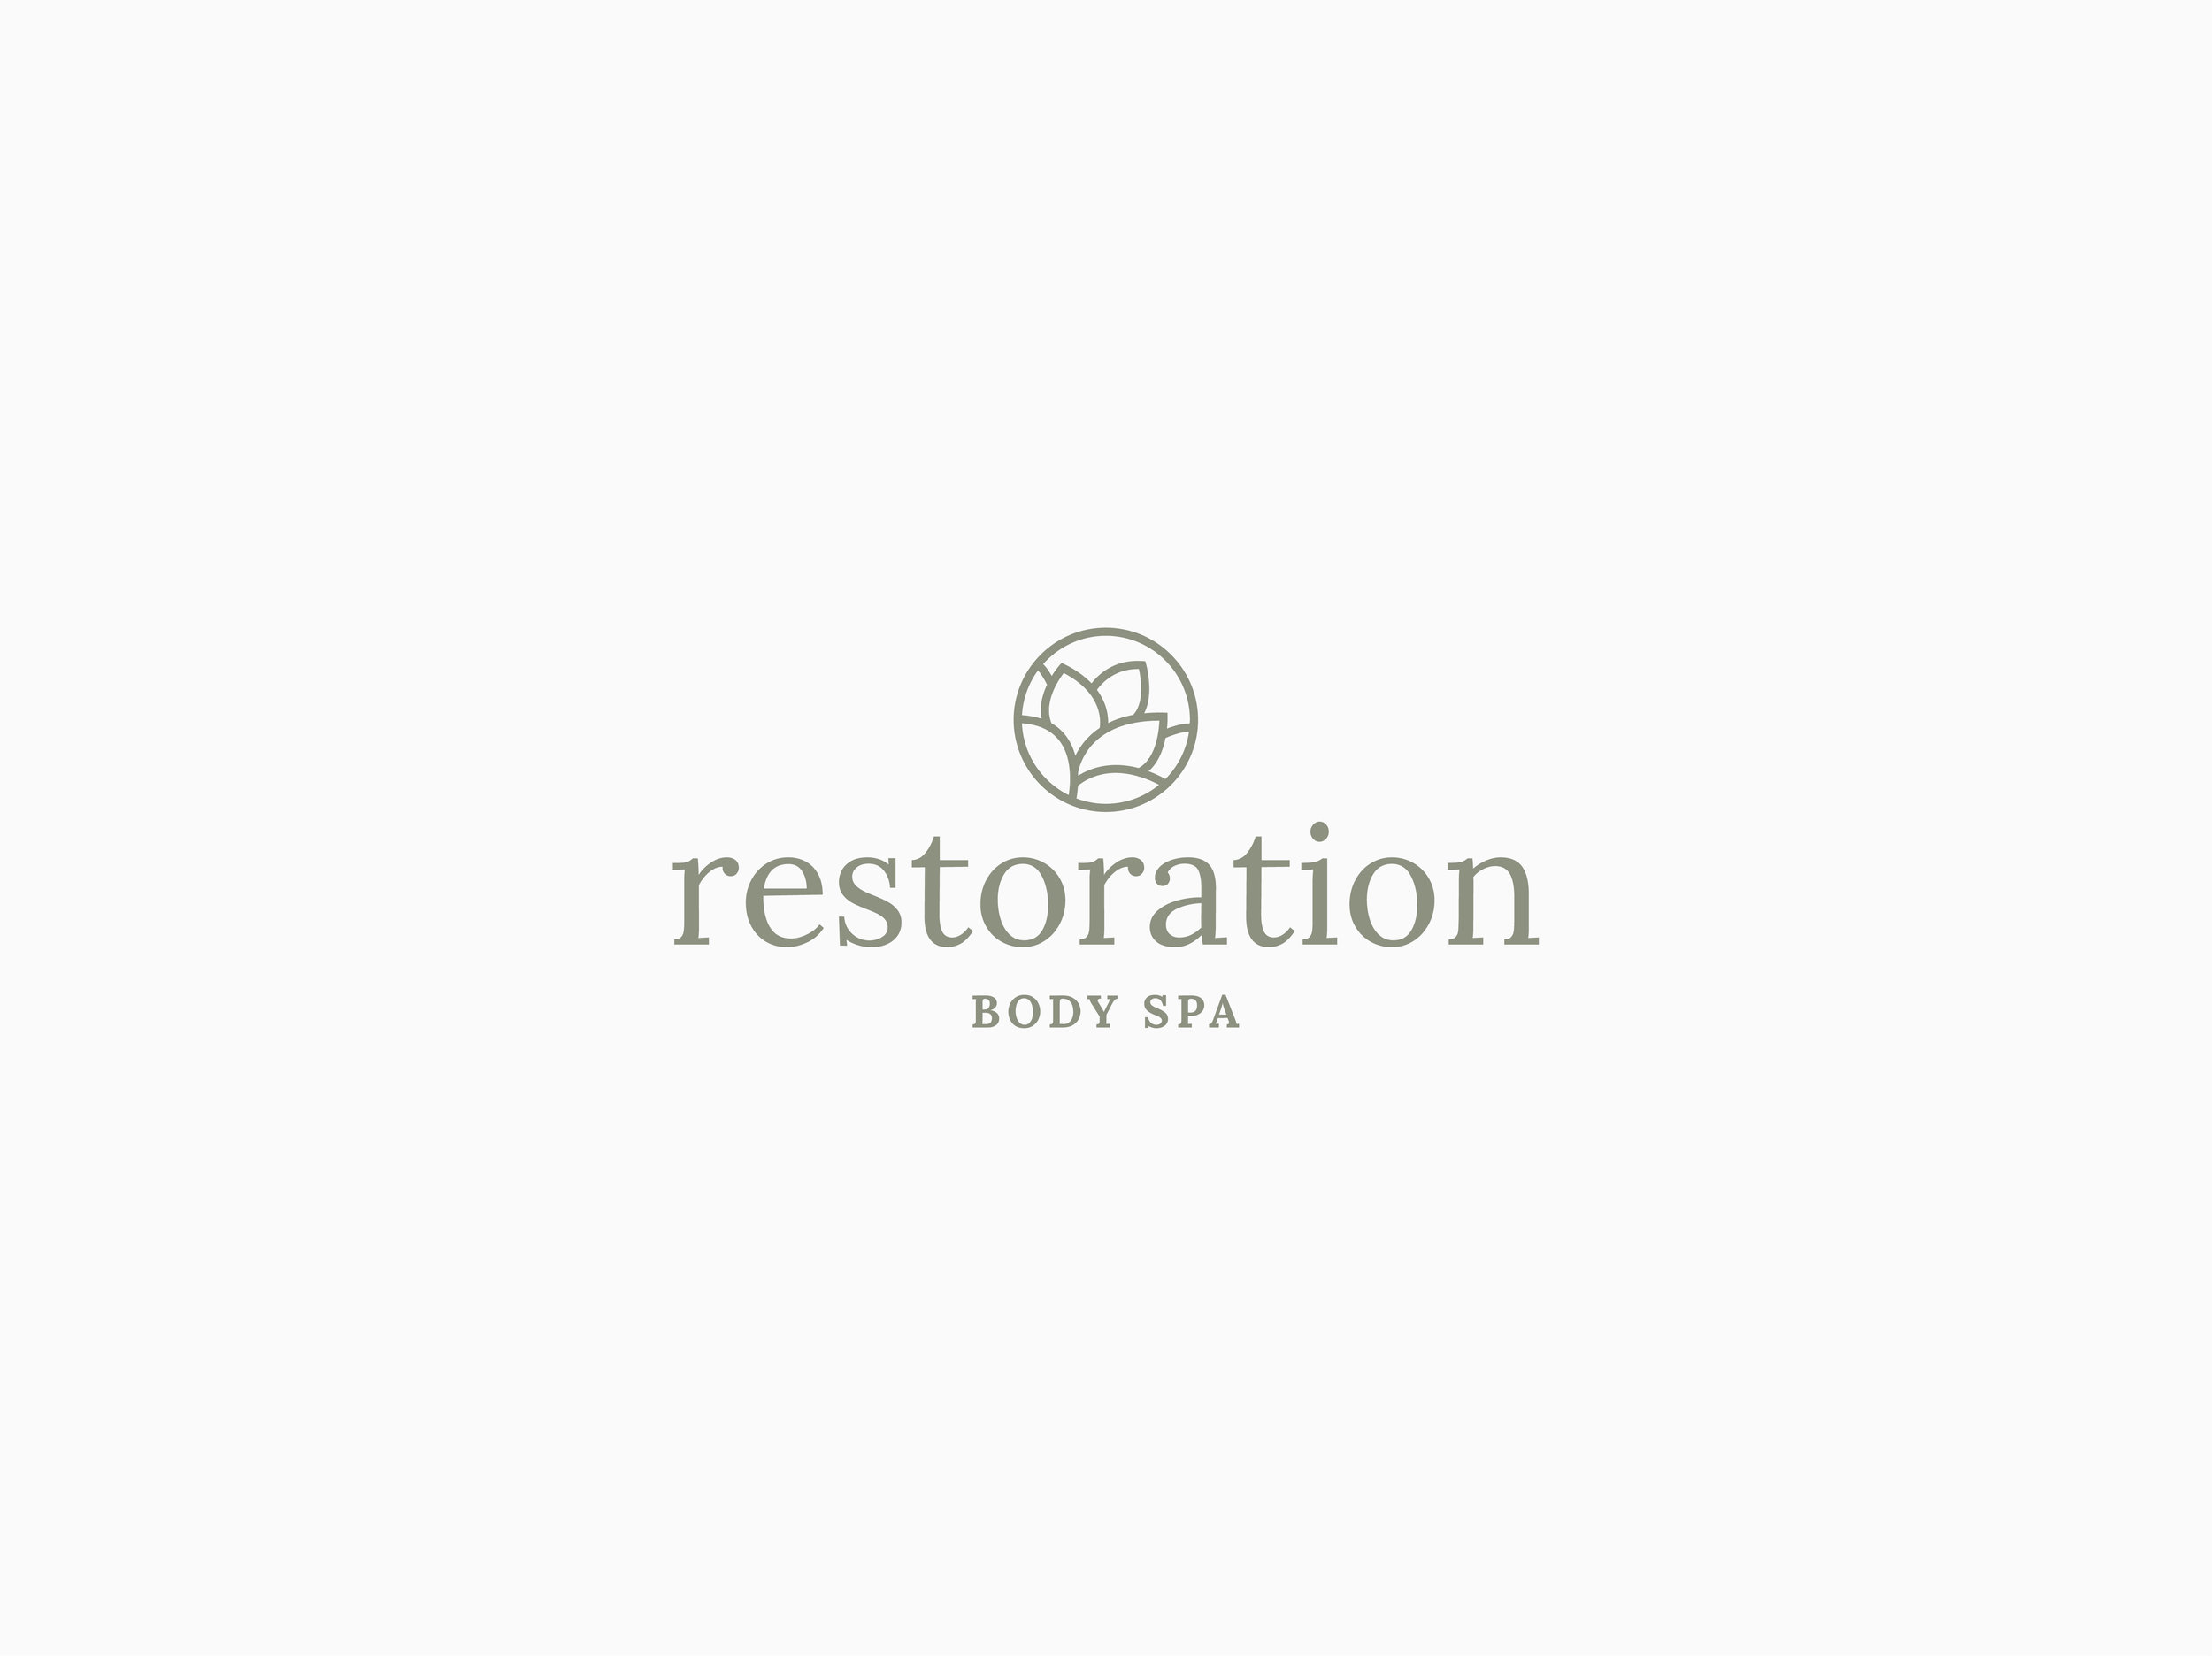 FlintHouse_RestorationBodySpa_Logo-03.jpg